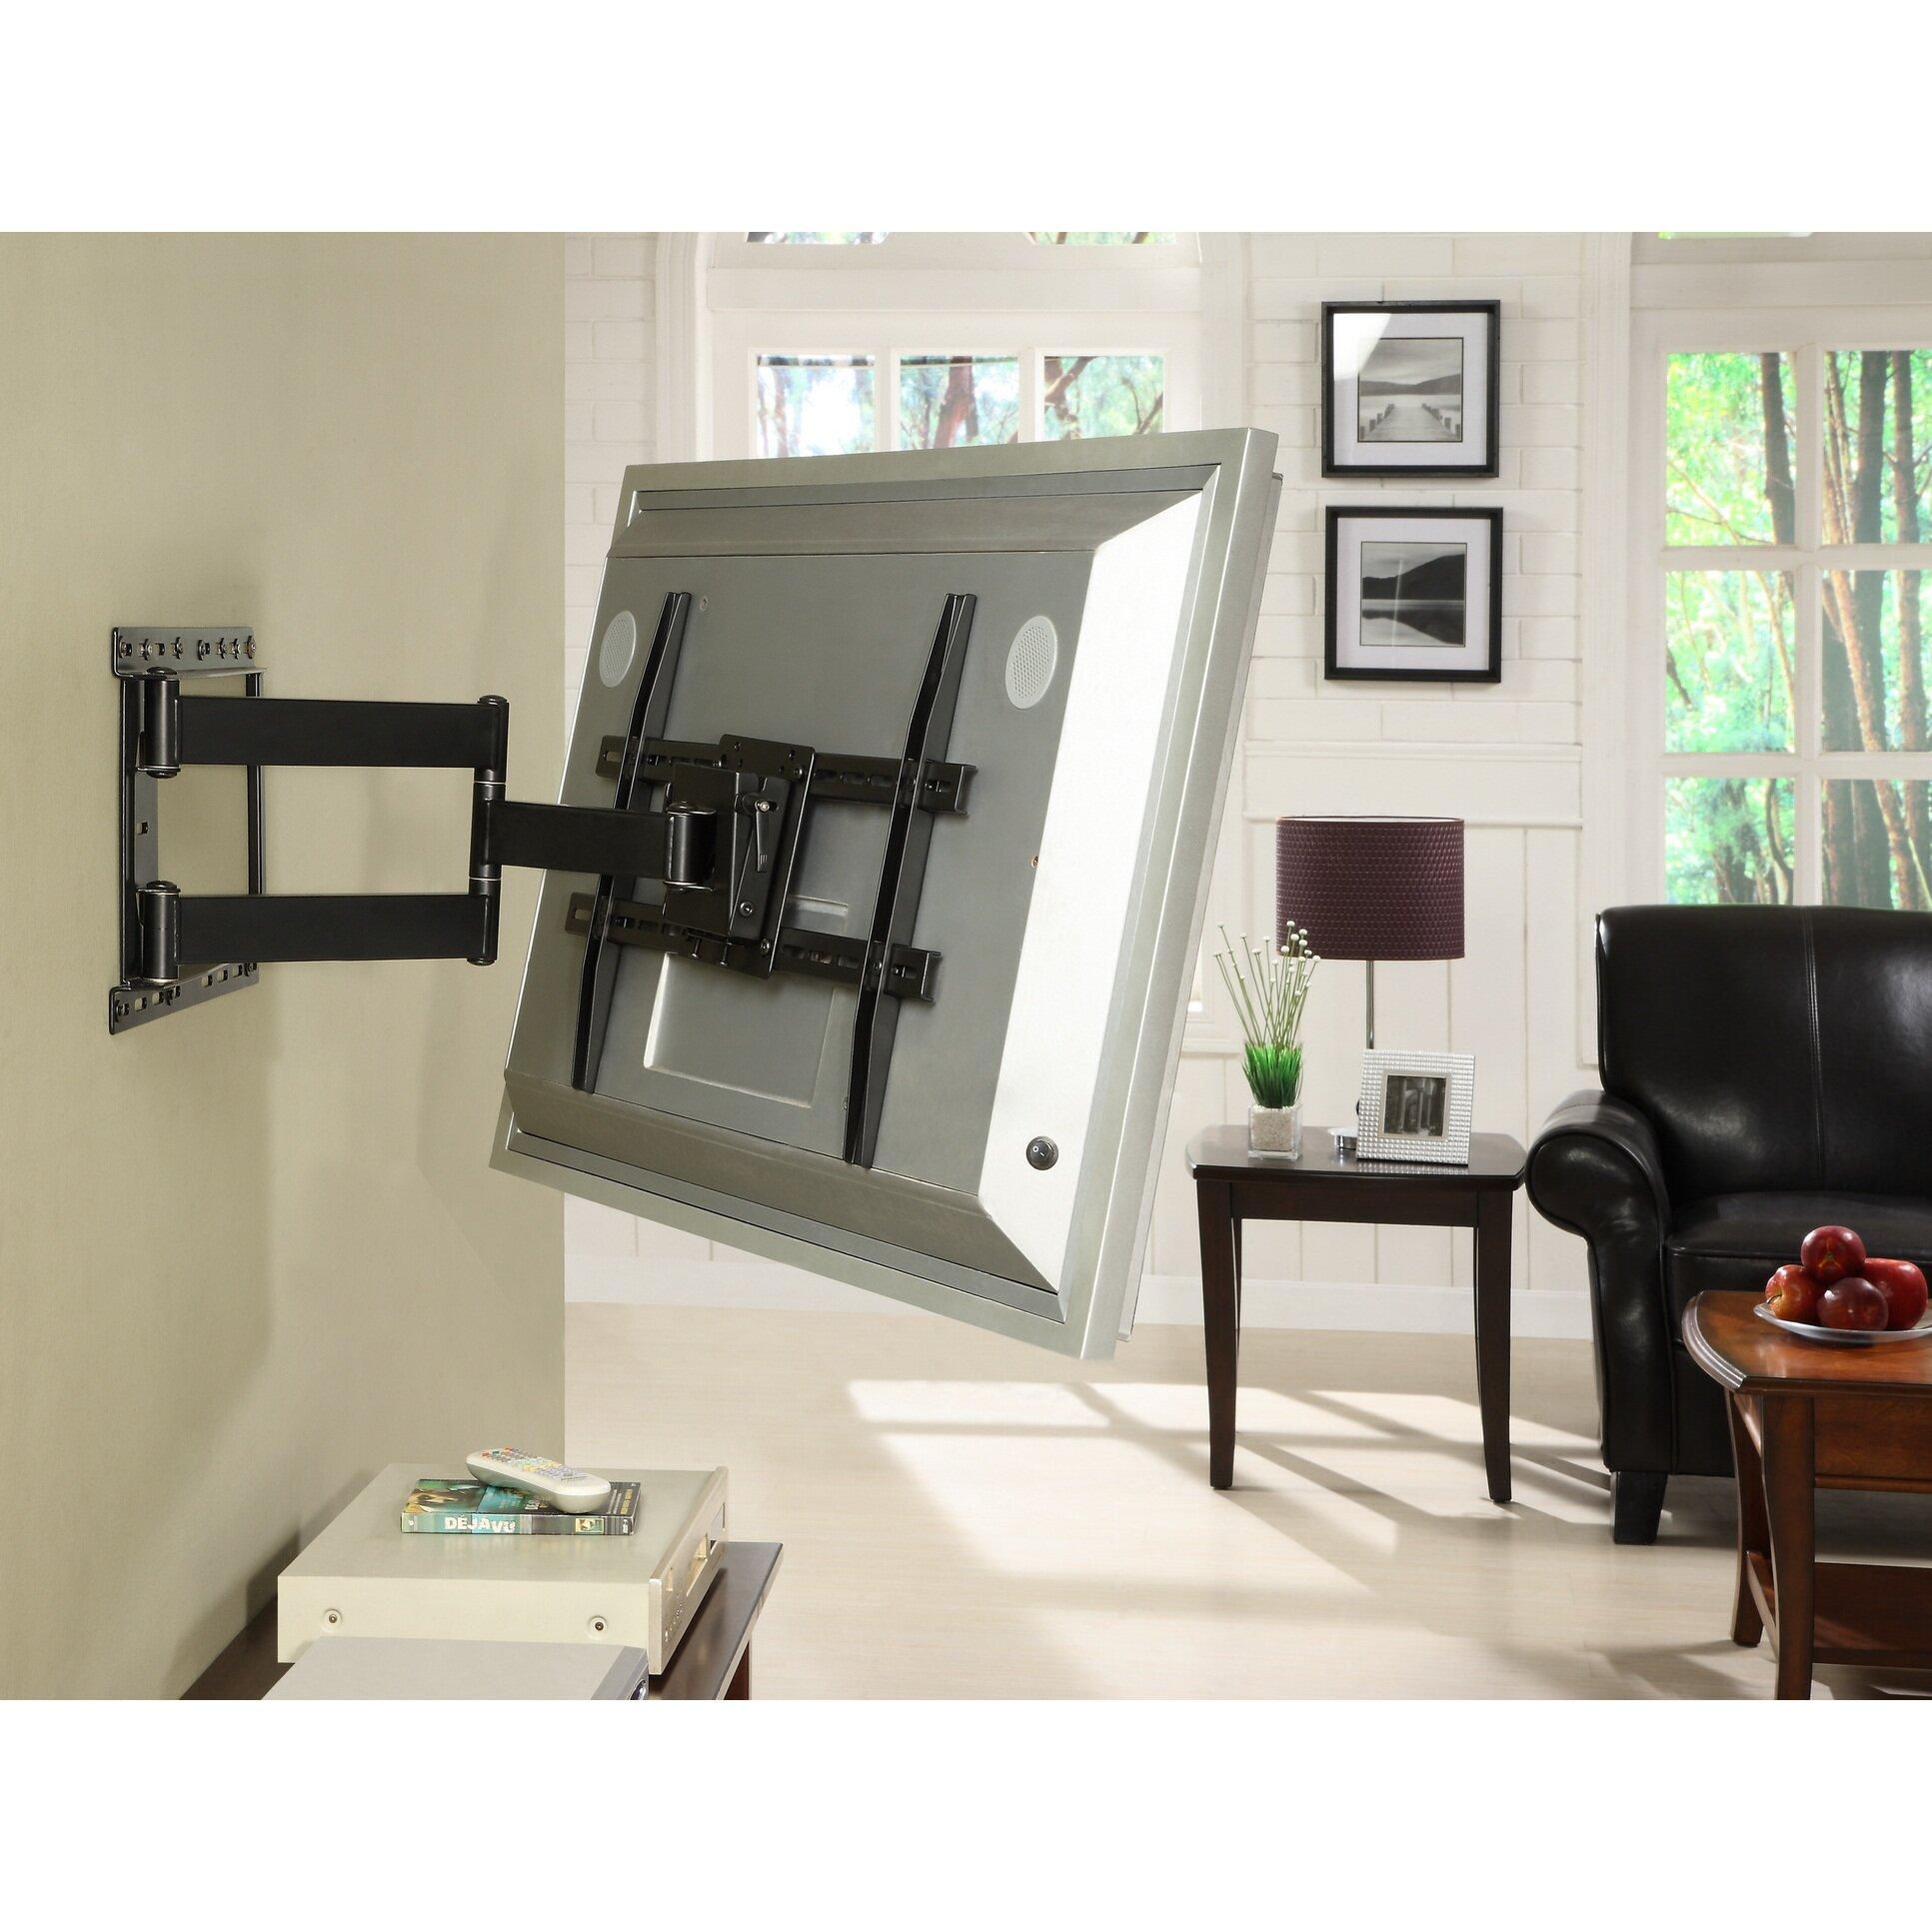 Dorm Room Tv Wall Mount